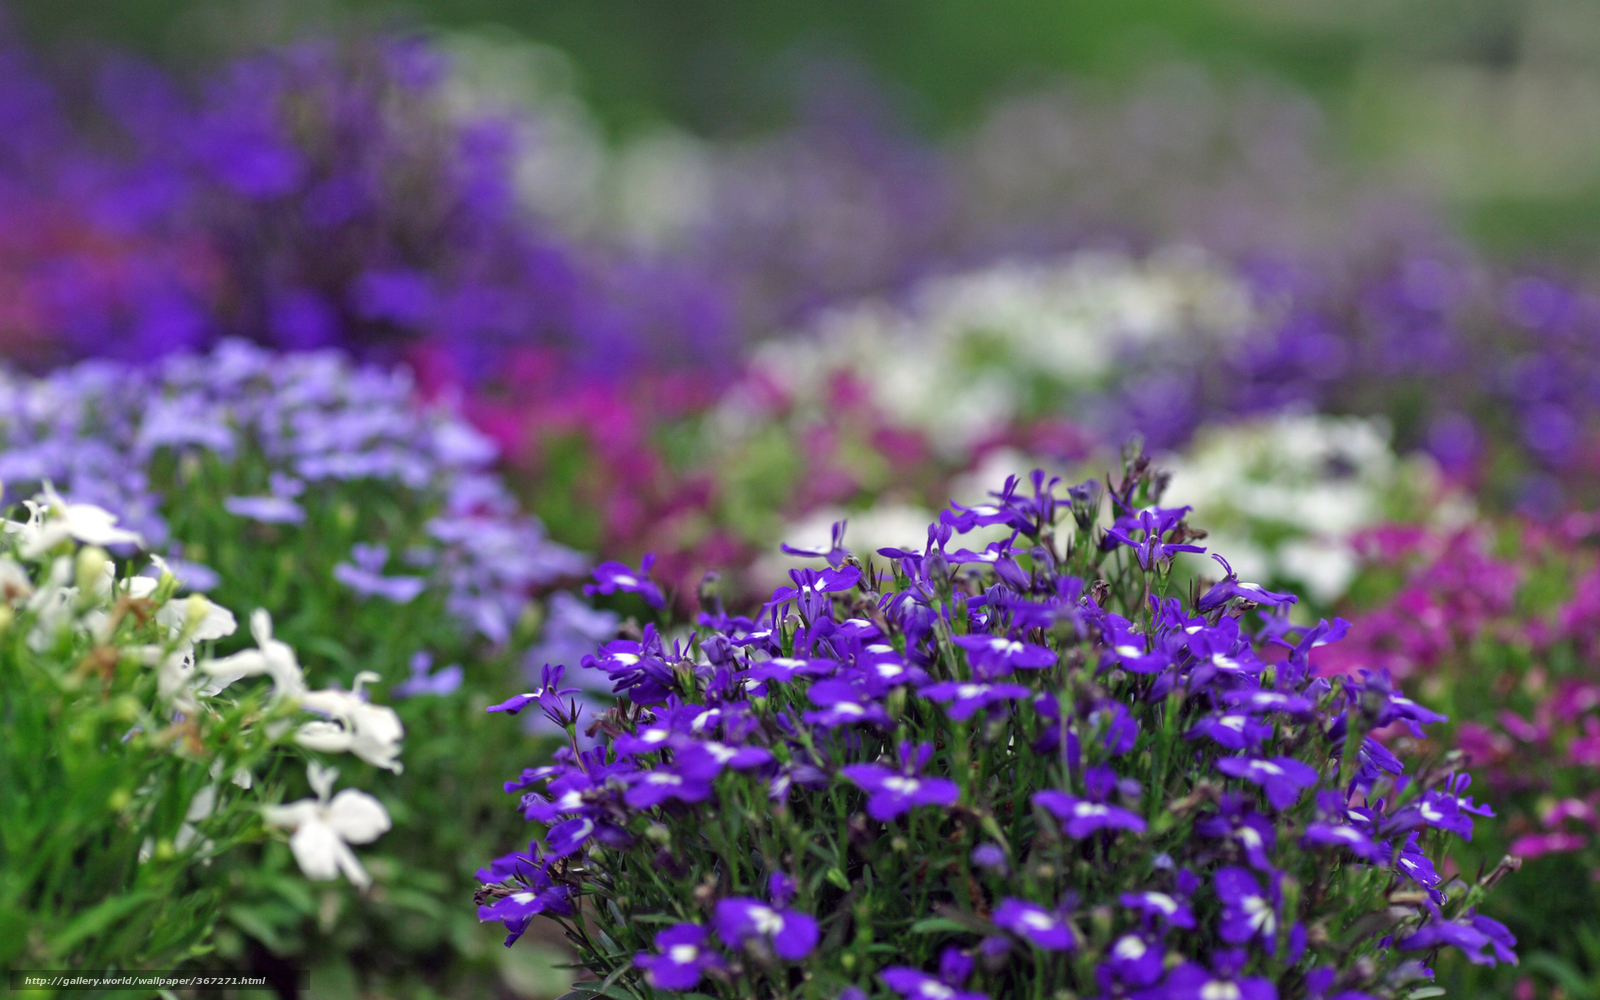 Фото растения с сиреневыми цветами